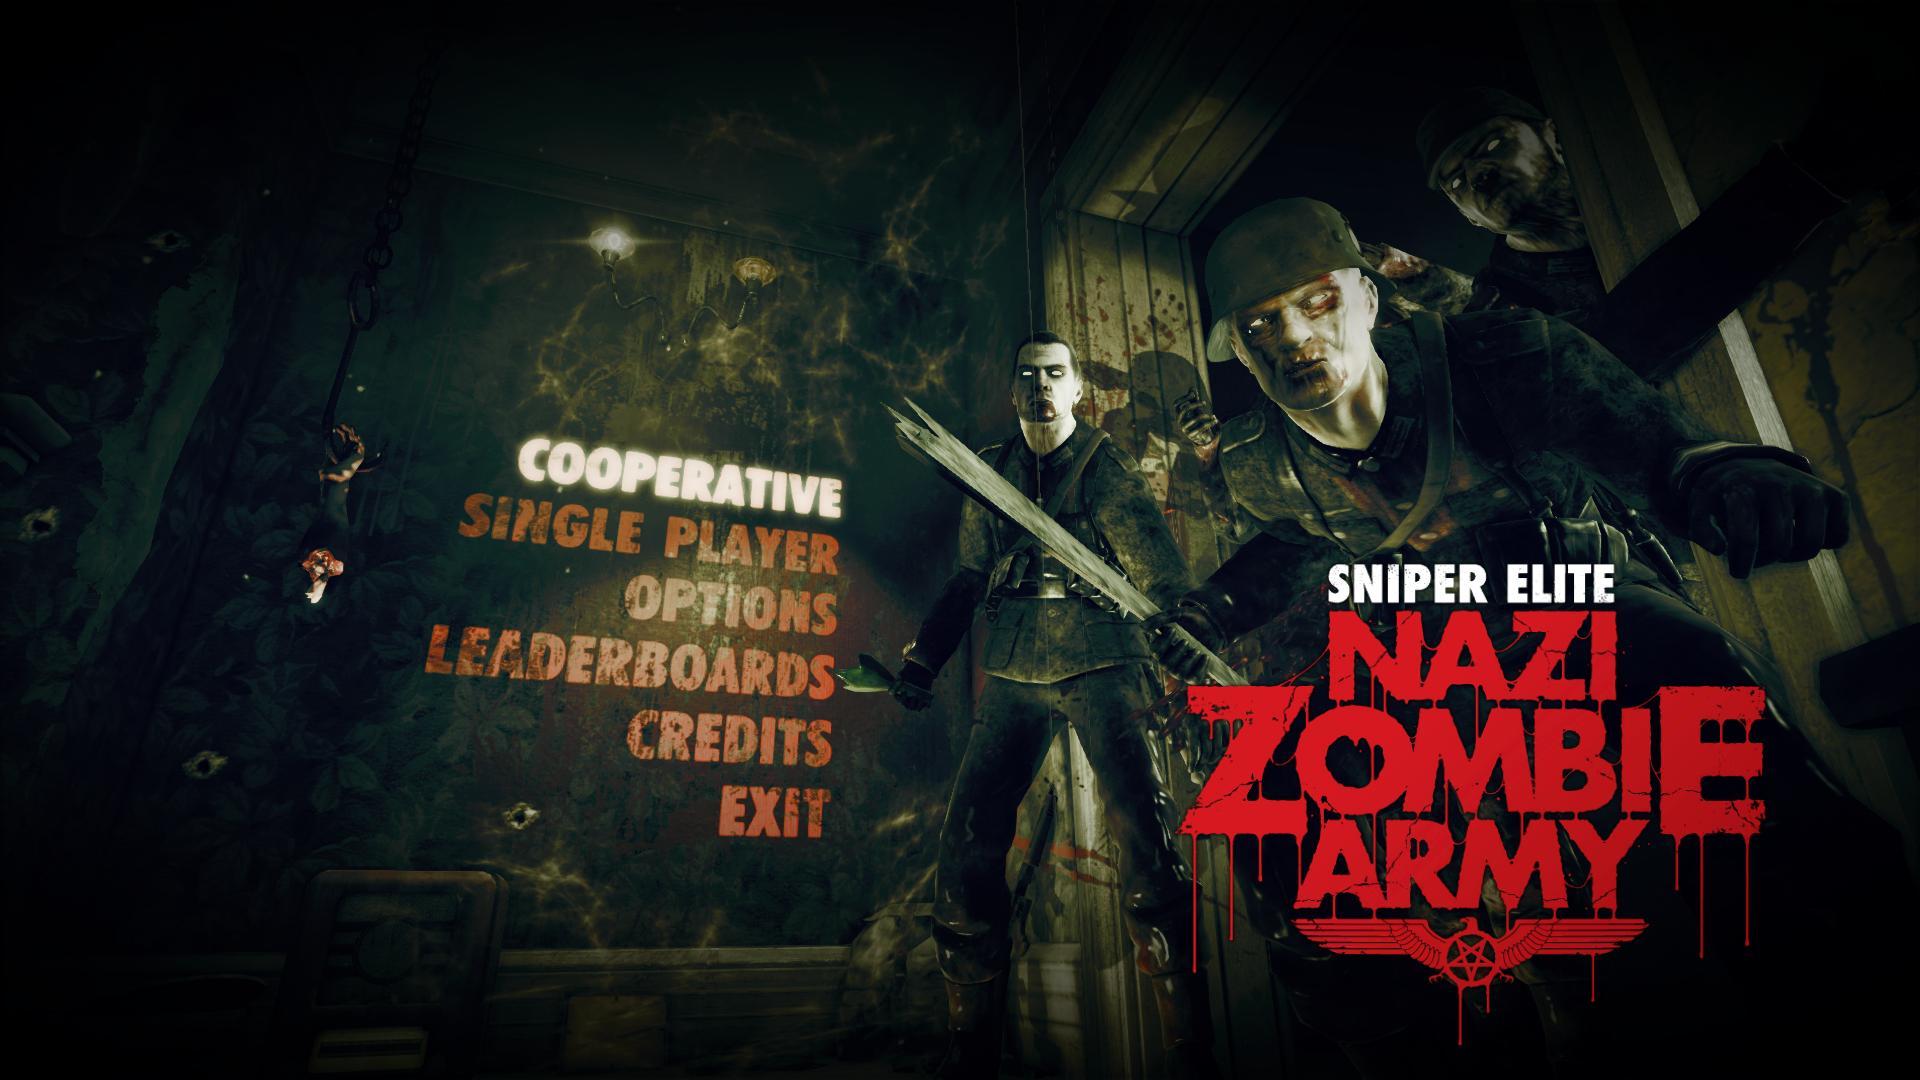 Ww2 Hd Wallpaper 187 Sniper Elite Nazi Zombie Army Dad S Gaming Addiction